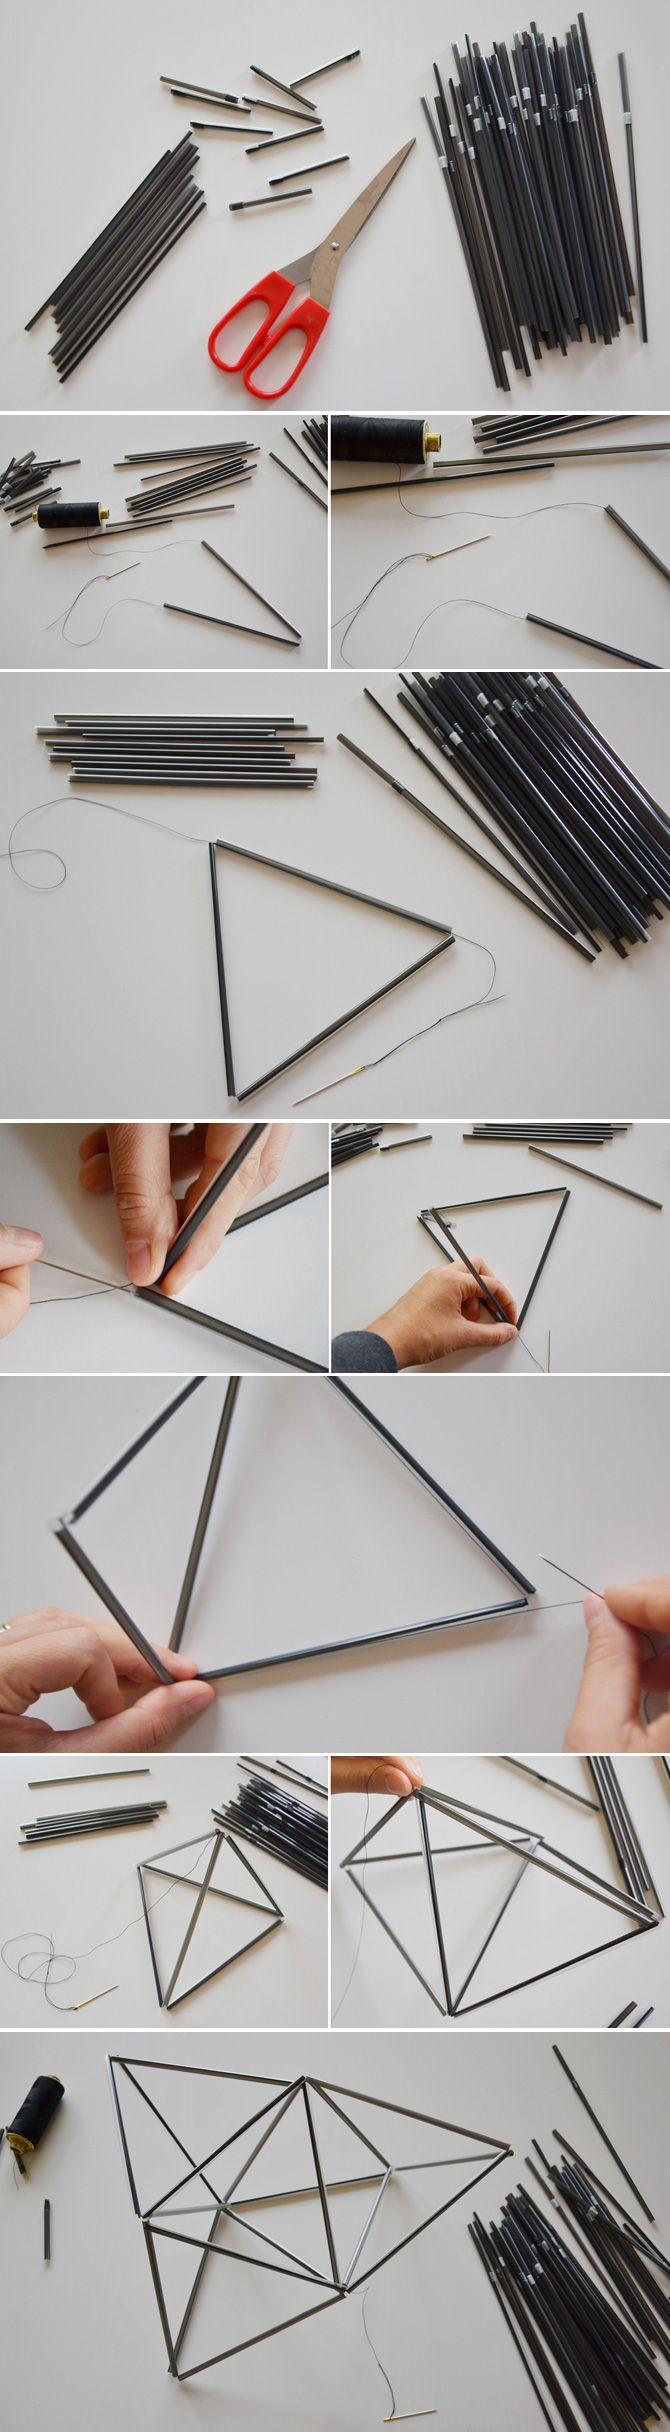 GEOMETRIC MOBILES DIY http://gucki.it/2013/10/09/diy-geometric-mobiles/